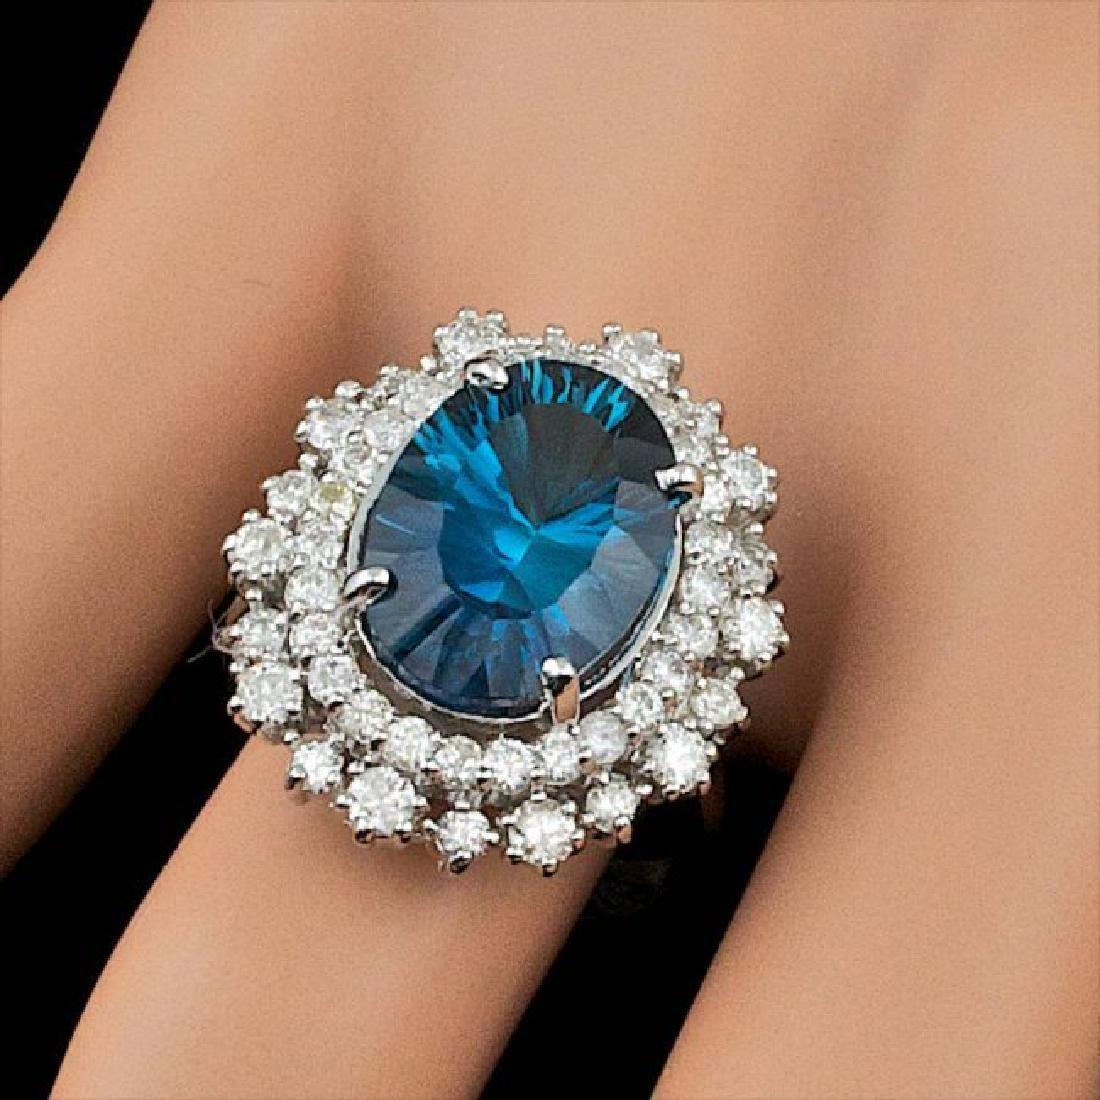 14k White Gold 7.00ct Topaz 1.50ct Diamond Ring - 4